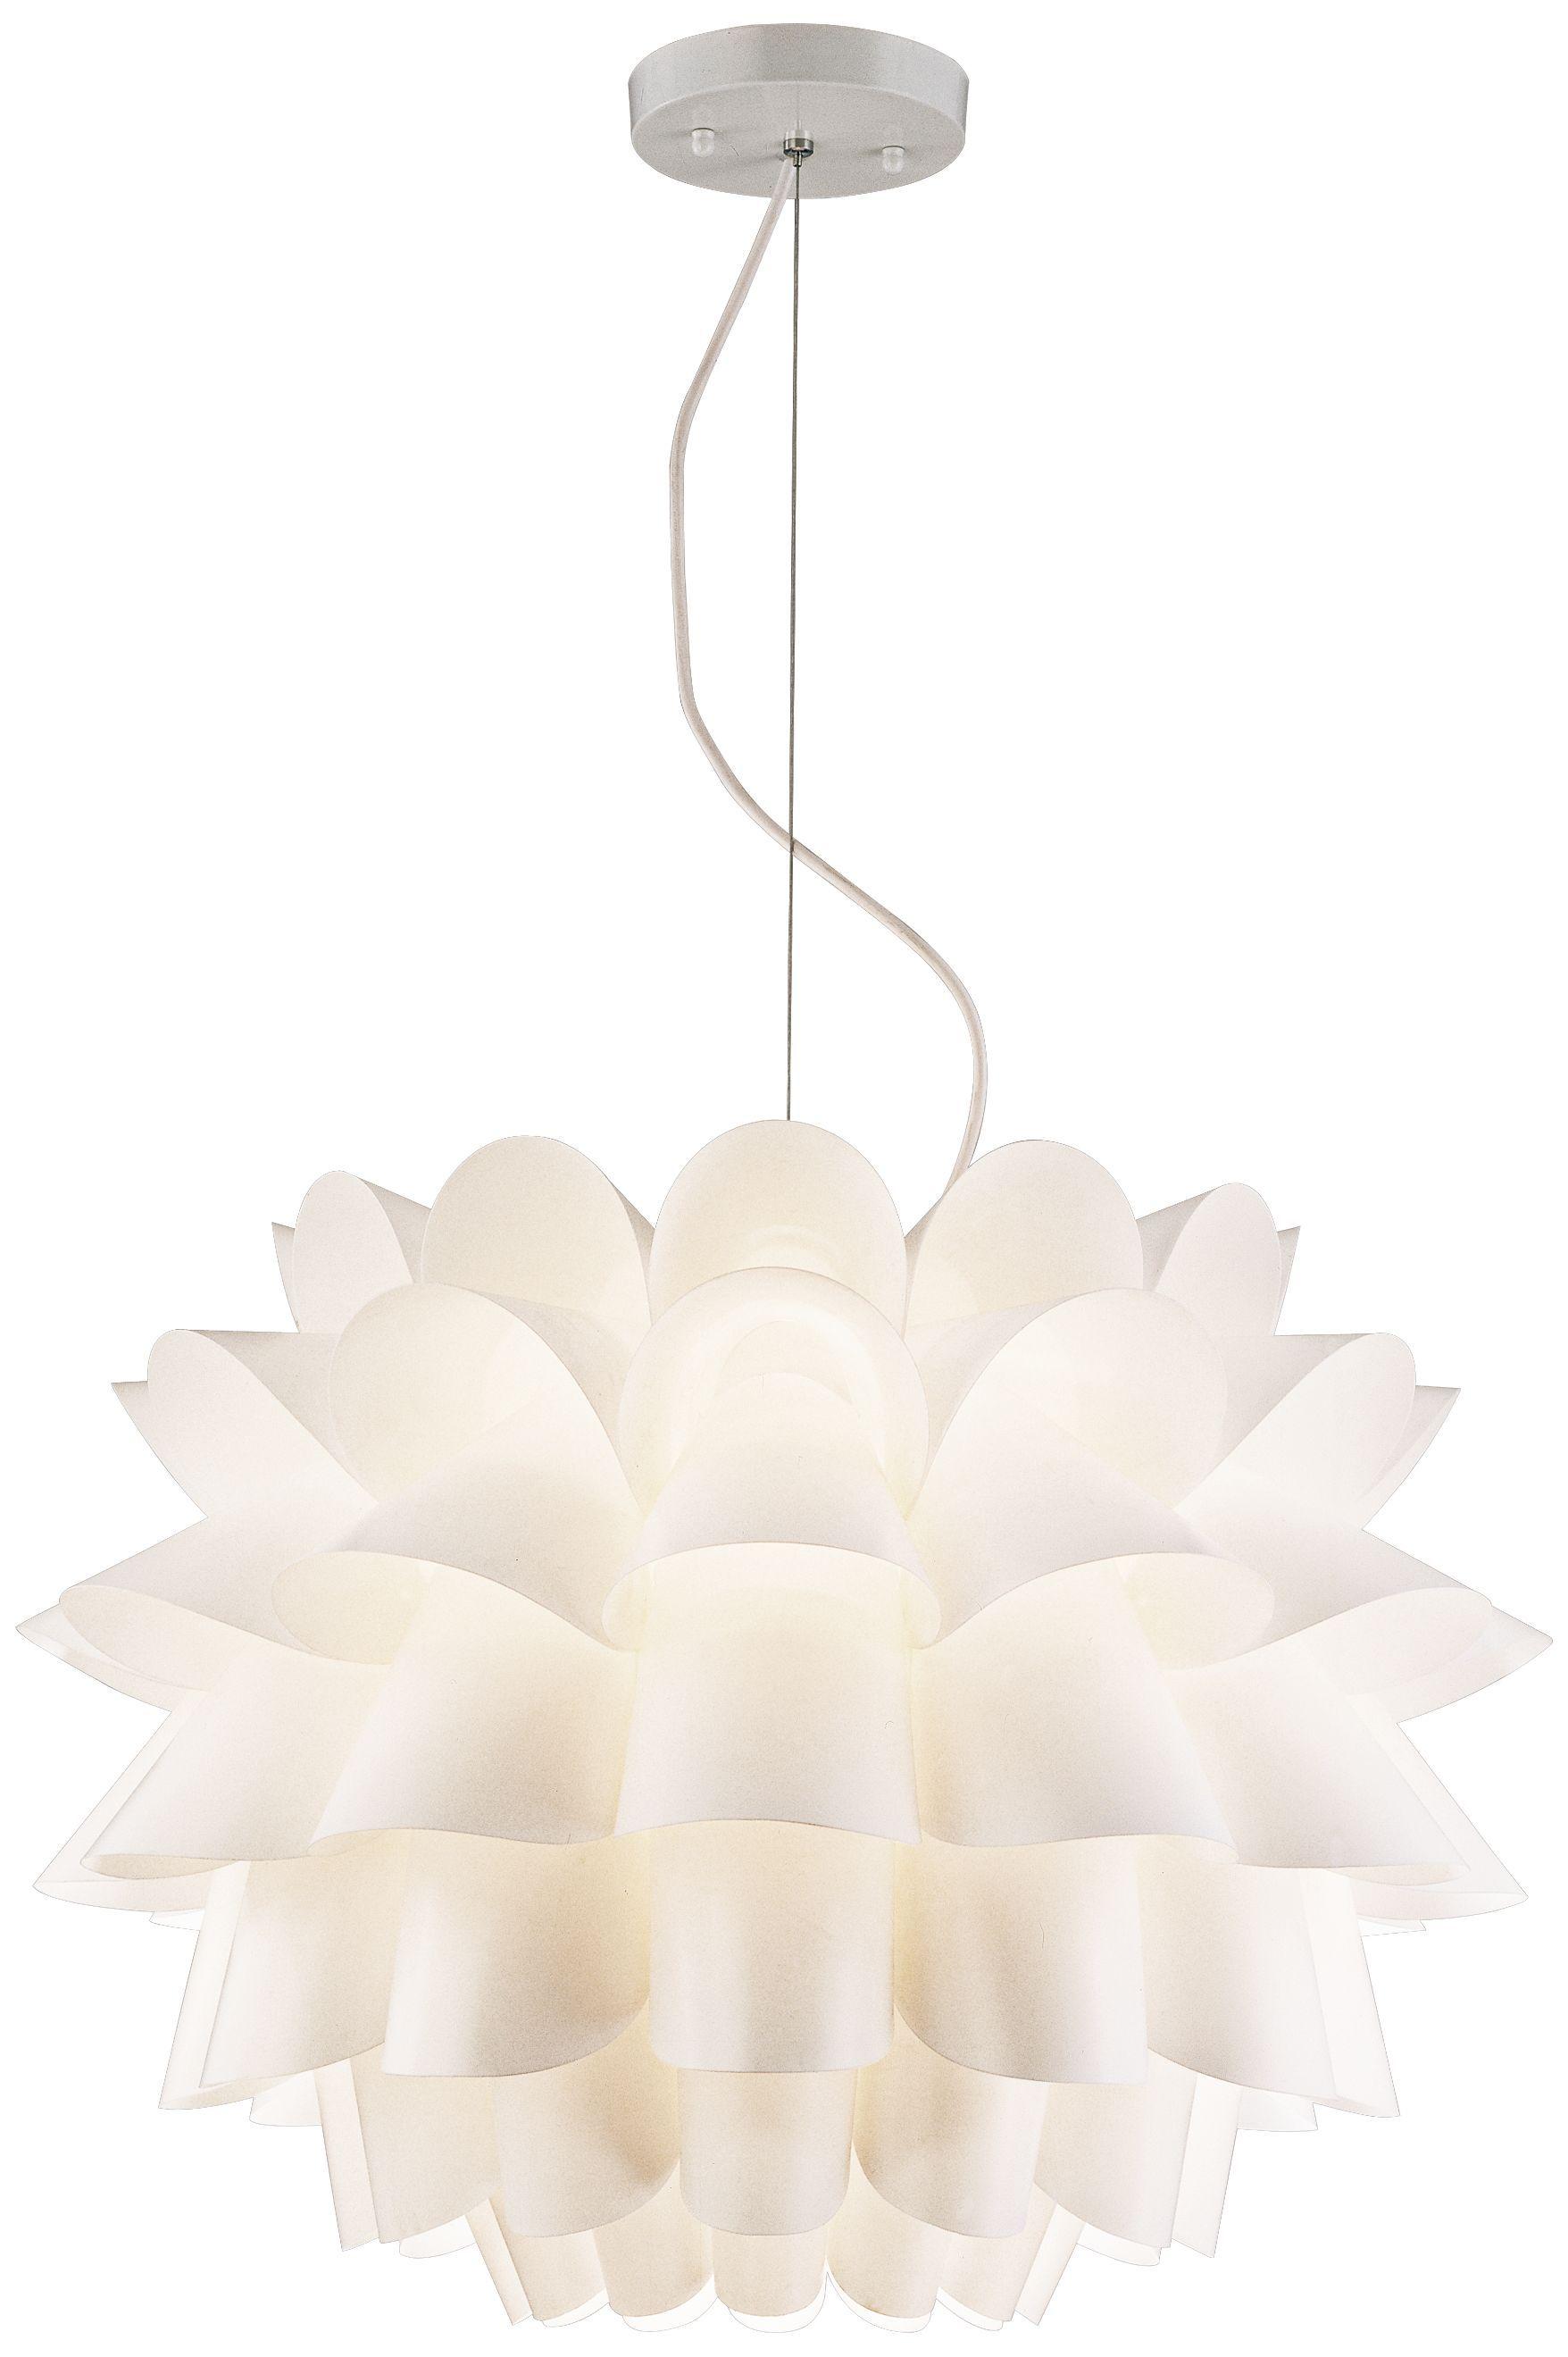 White Flower Possini Euro Design Pendant Chandelier Eu02475